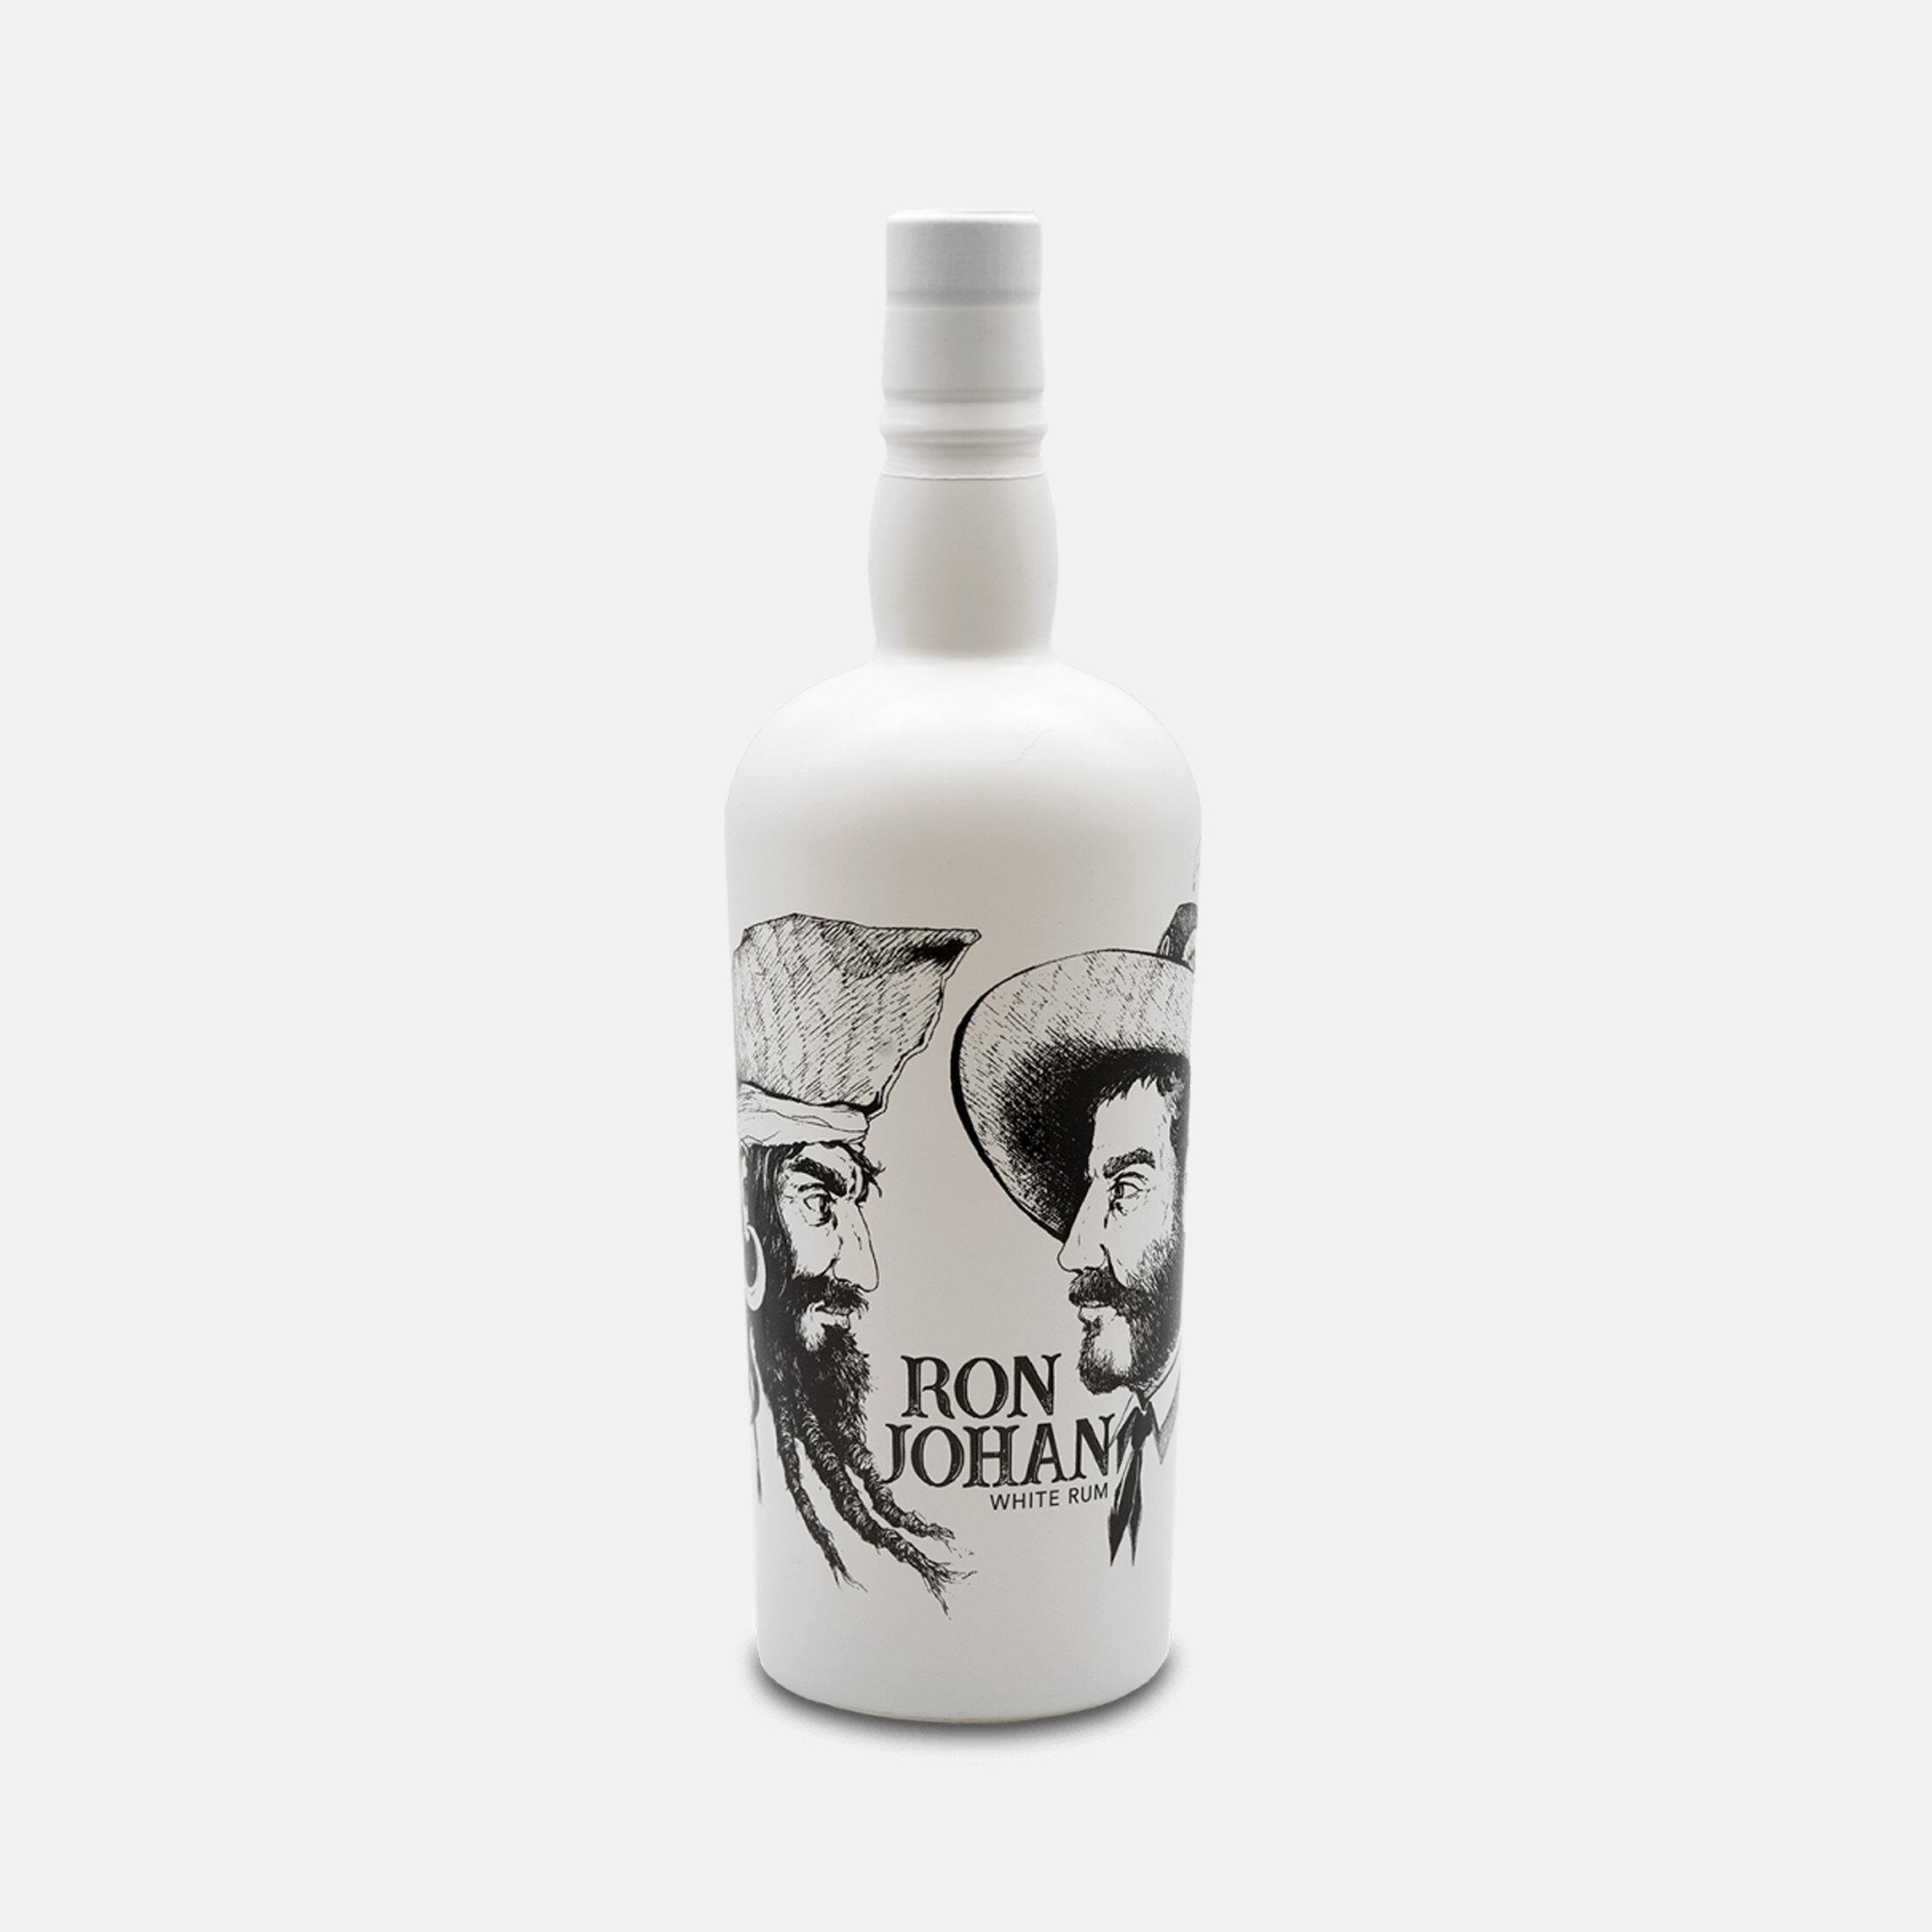 Ron Johan White Rum [700ml]